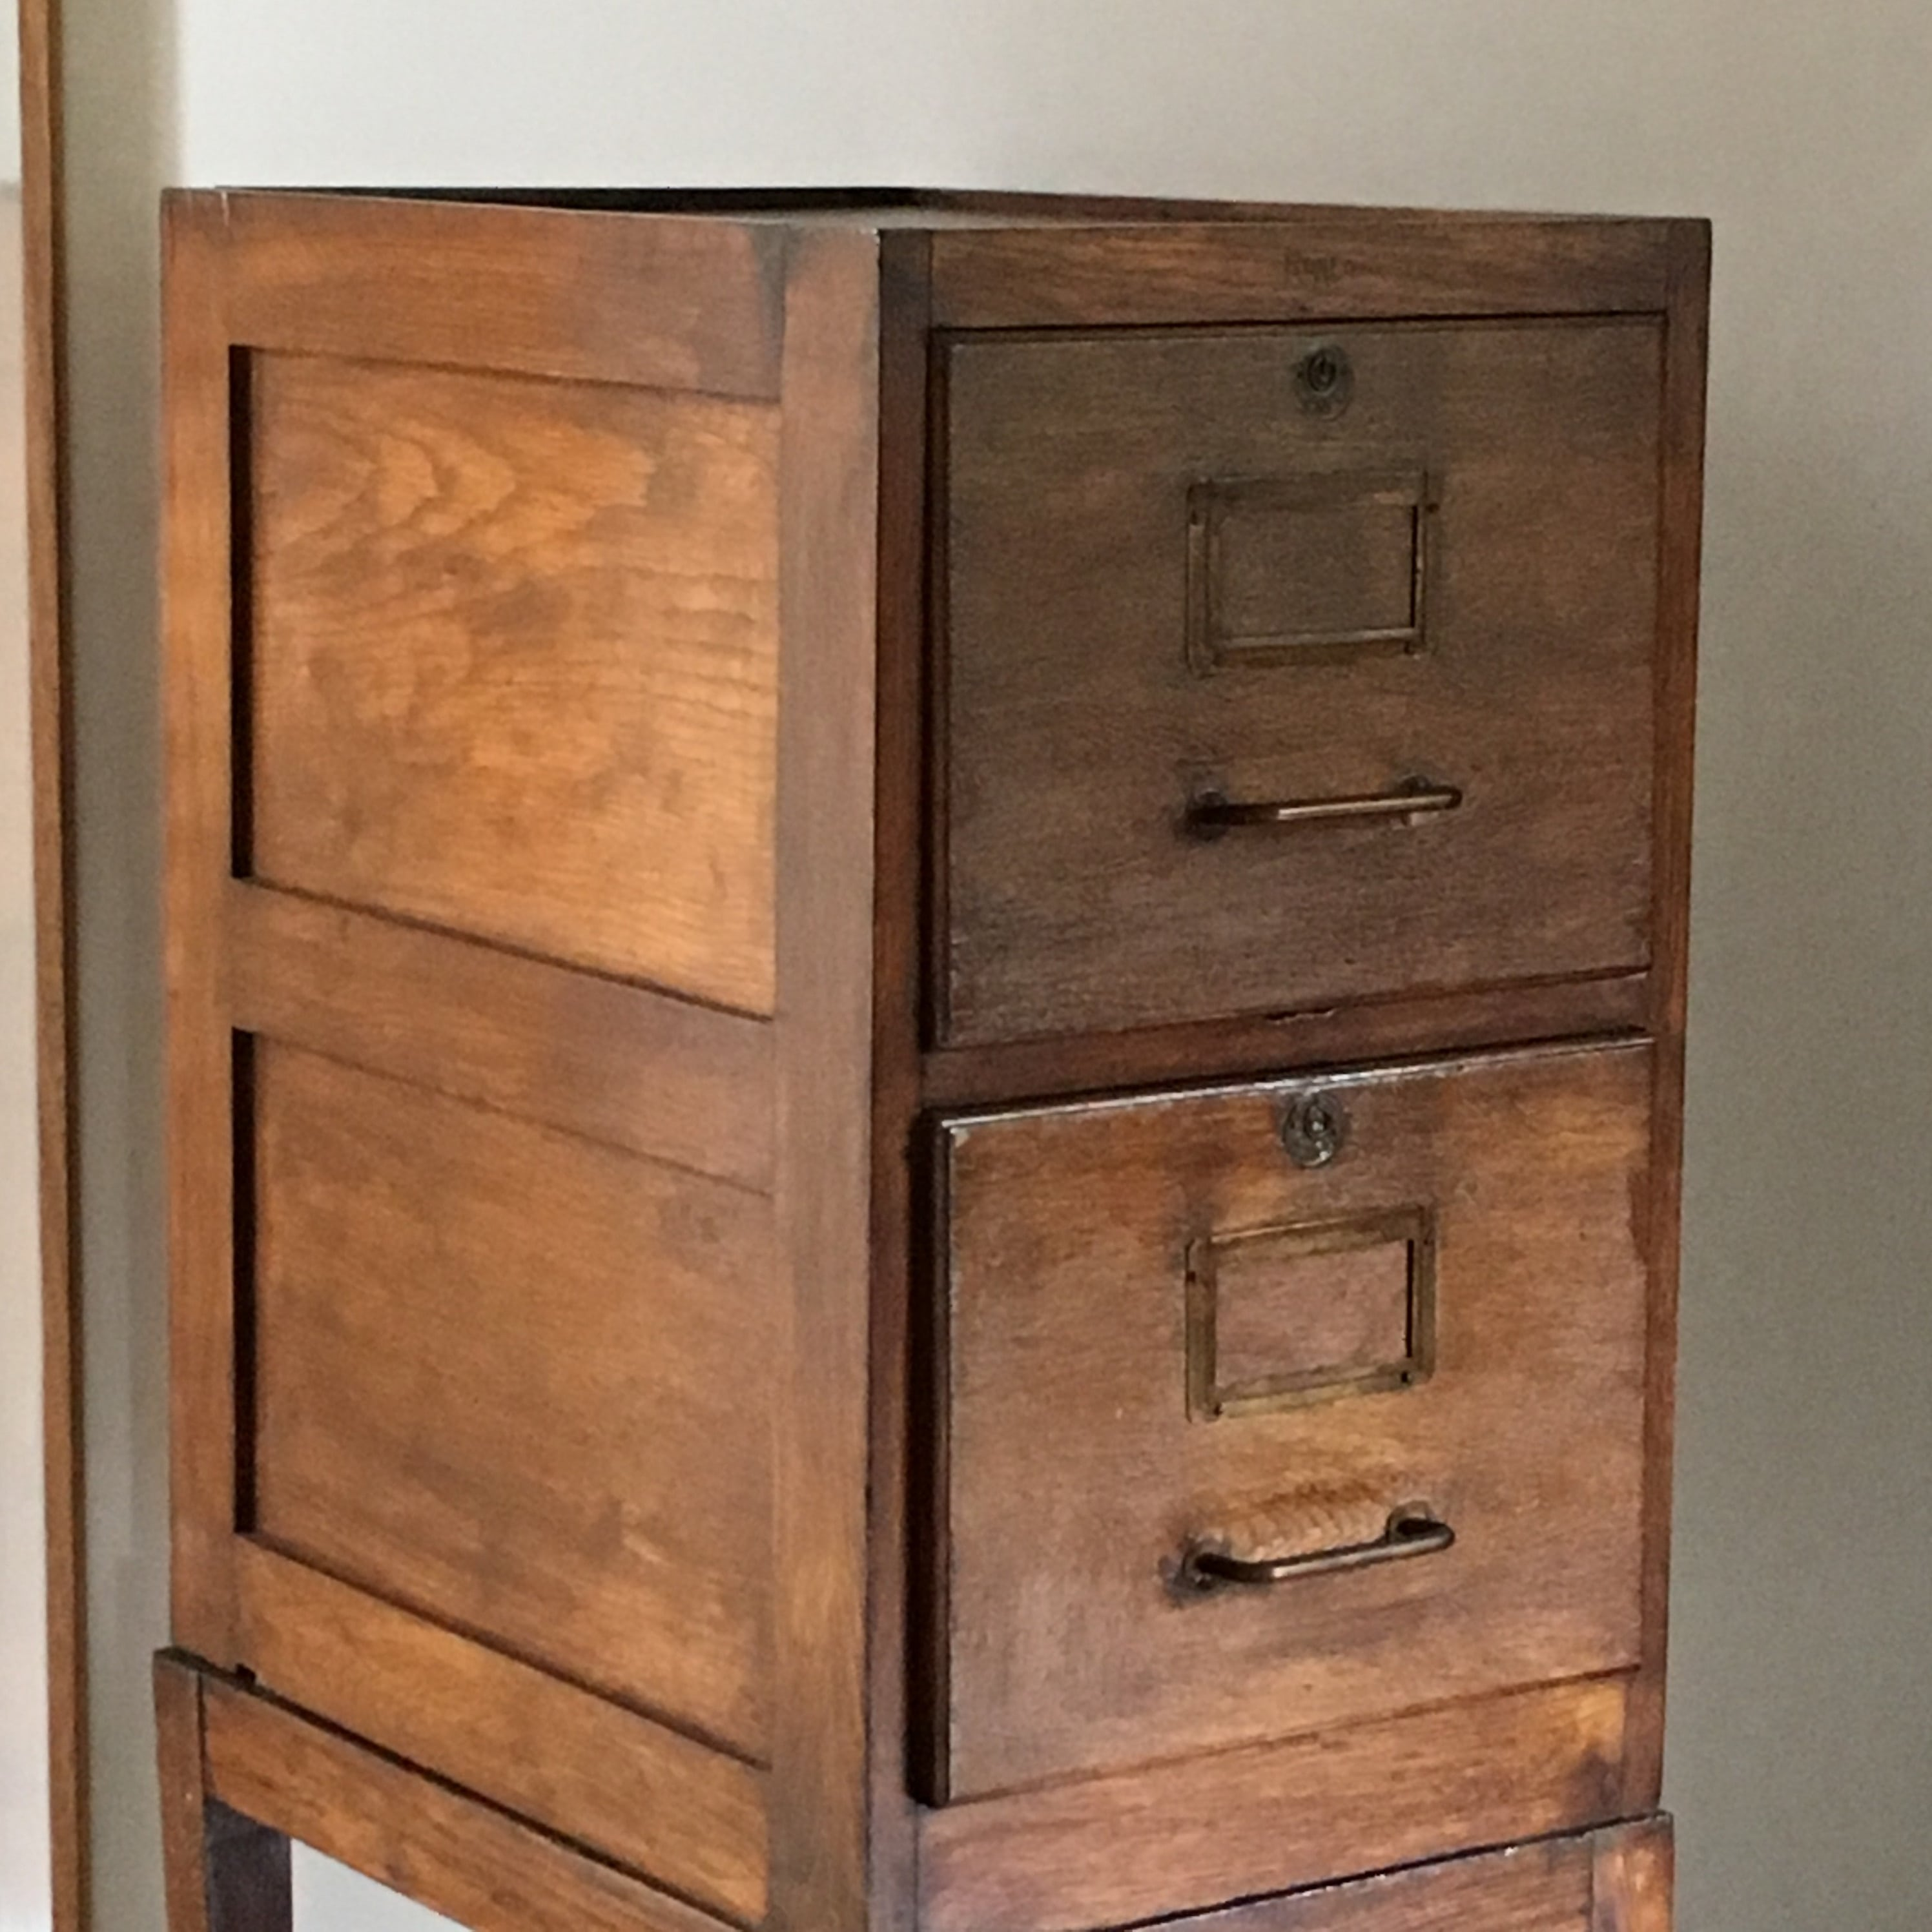 casier roneo en bois lignedebrocante brocante en ligne chine pour vous meubles vintage et. Black Bedroom Furniture Sets. Home Design Ideas